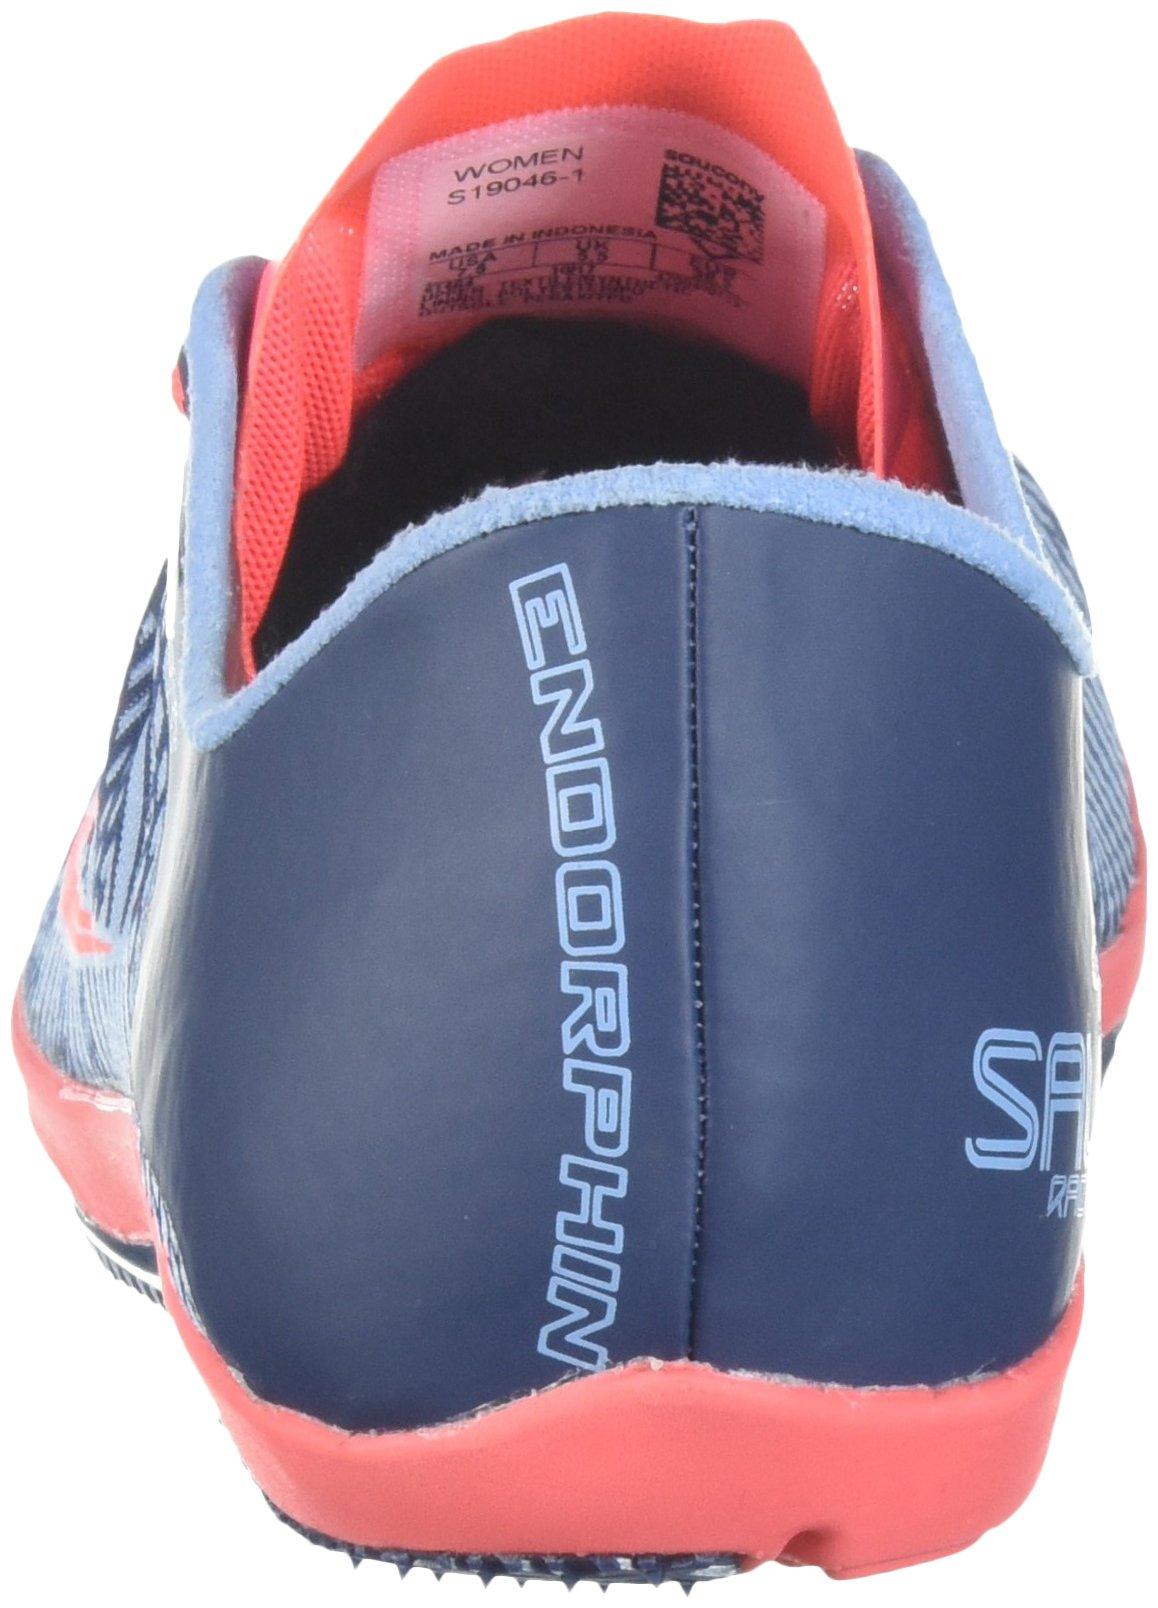 71PjIwrBPyL - Saucony Endorphin 2 Women's Running Spikes - SS19